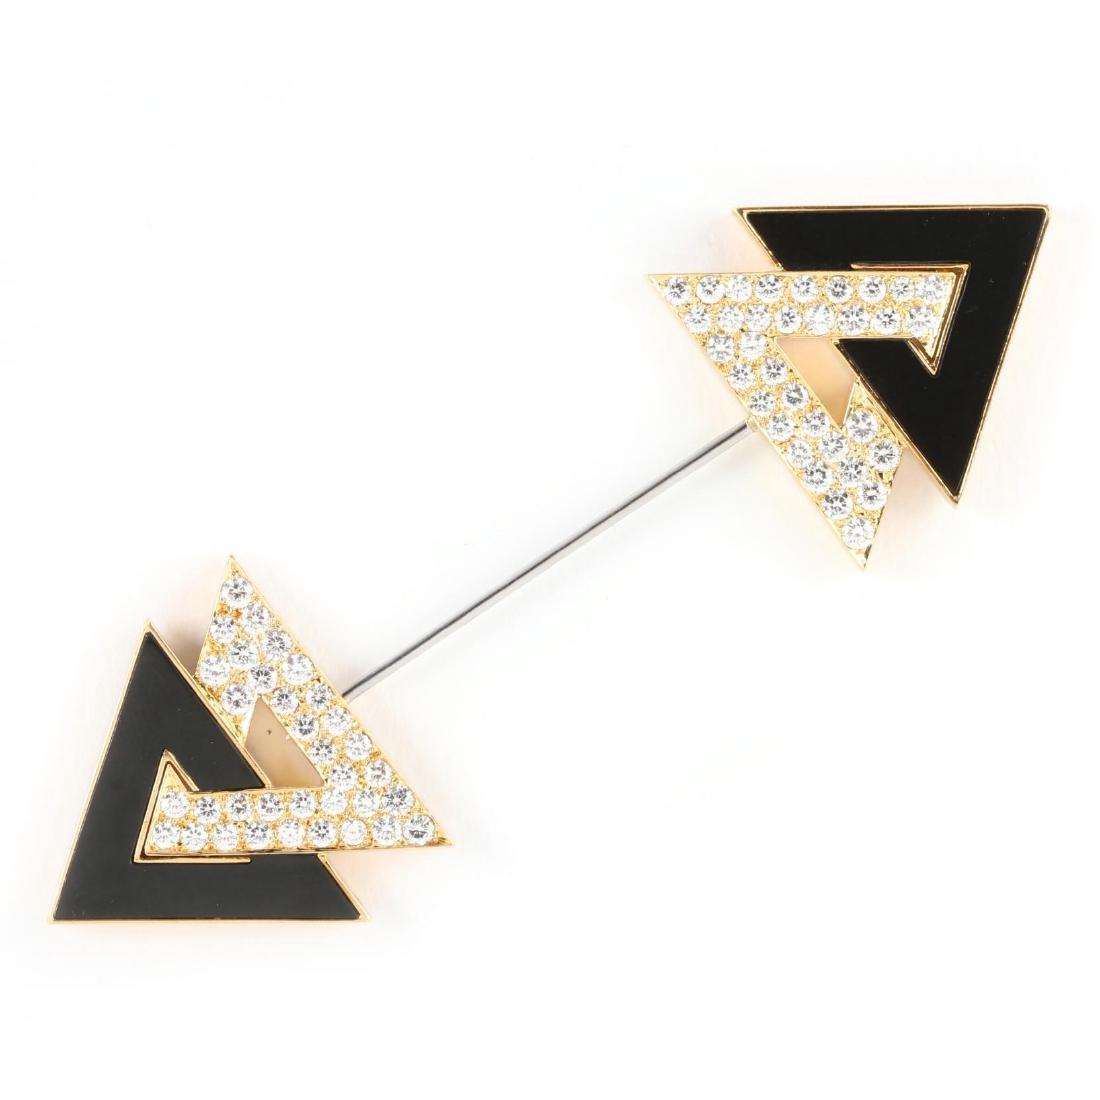 18KT Diamond and Onyx Brooch, Keil